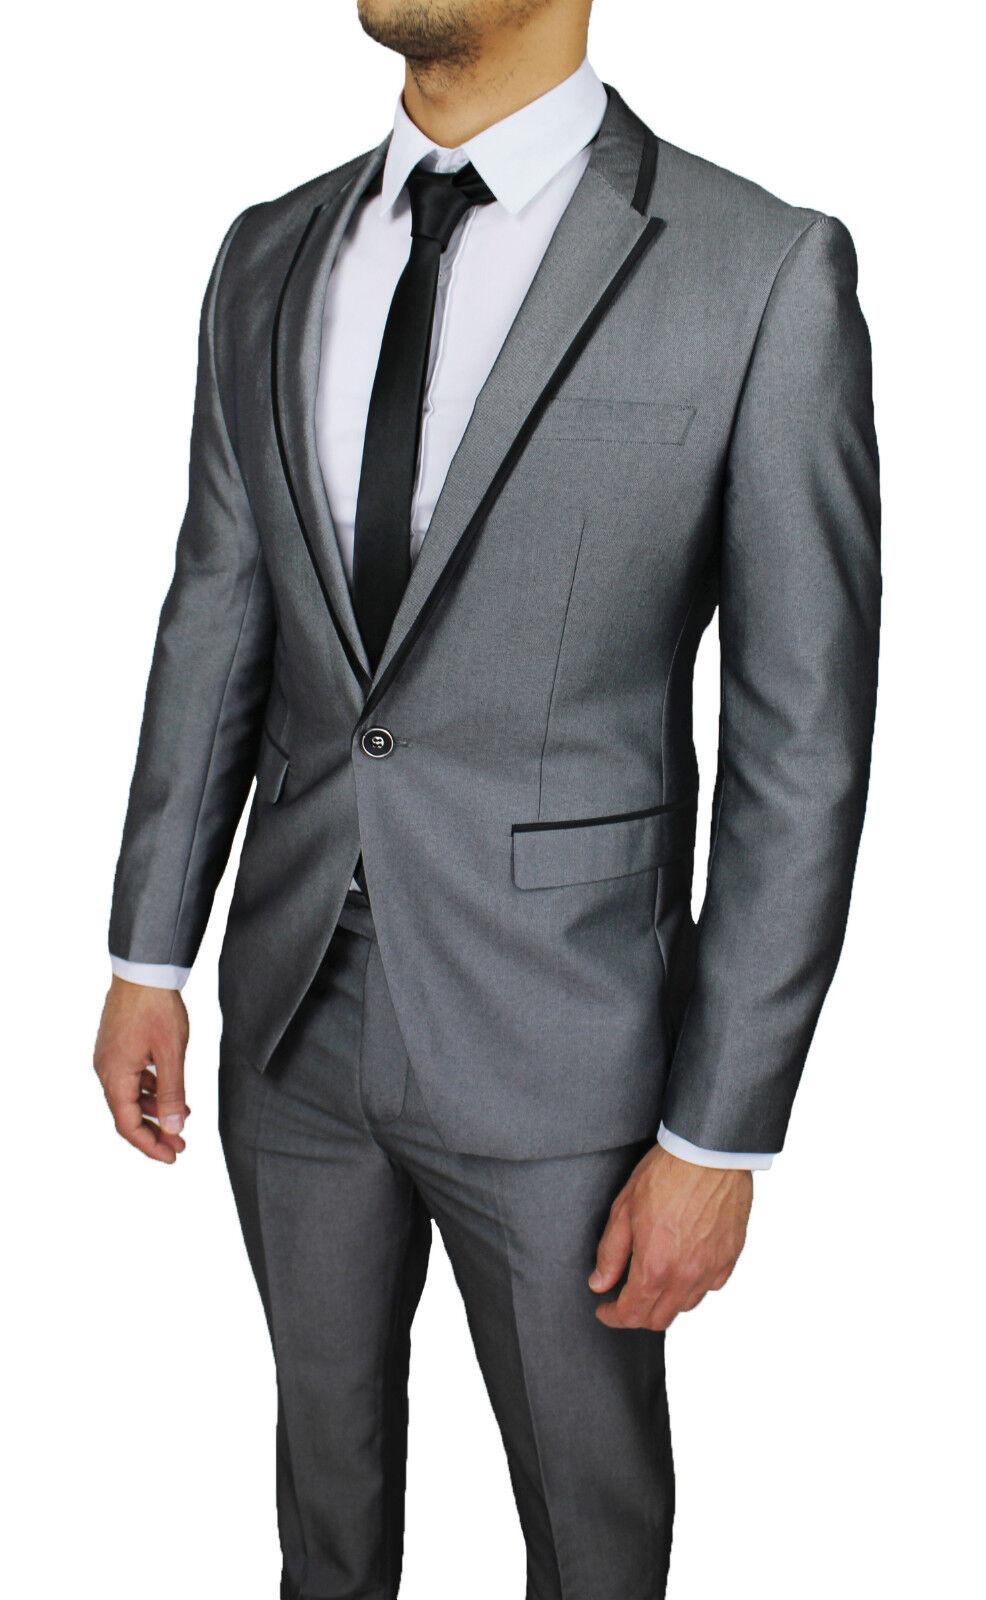 Vestiti Eleganti Uomo Grigio.Abito Completo Uomo Diamond Sartoriale Grigio Smoking Raso